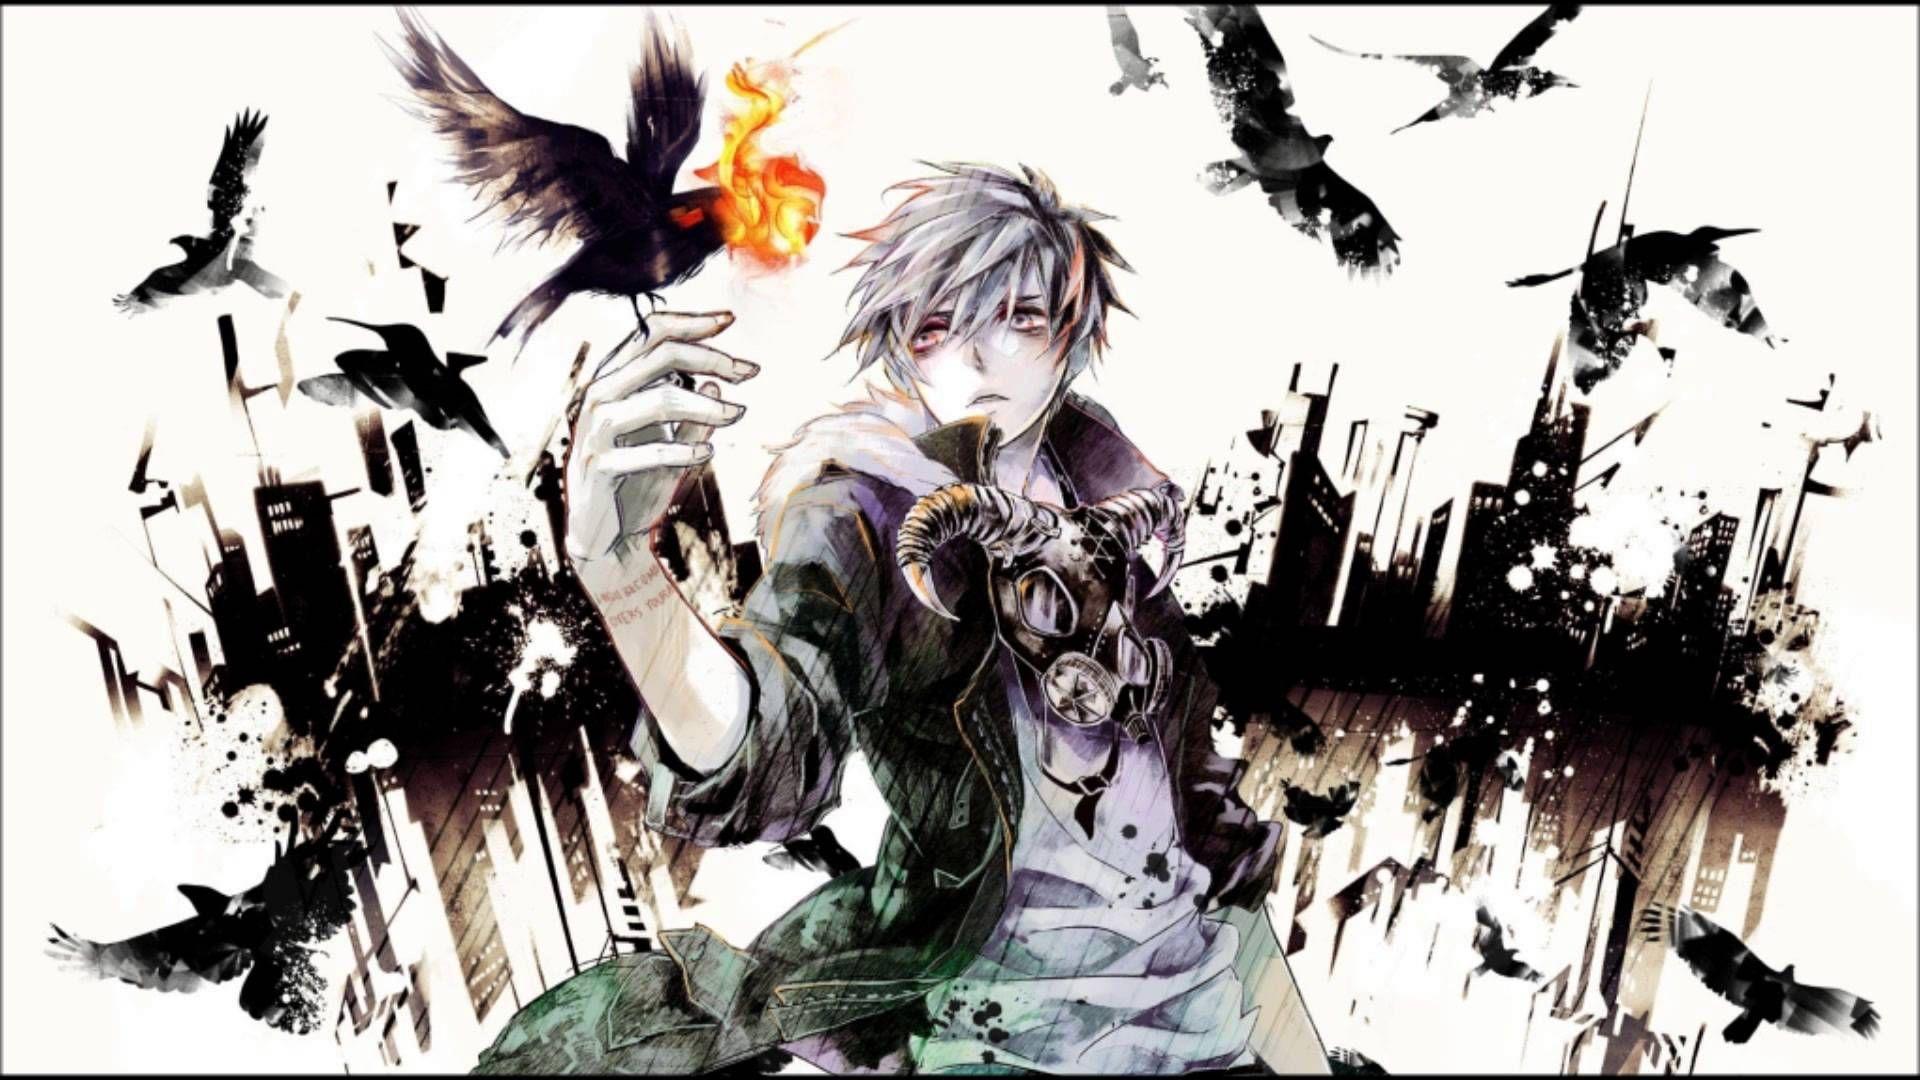 Nightcore No Ordinary Love Anime Anime Artwork Anime Boy